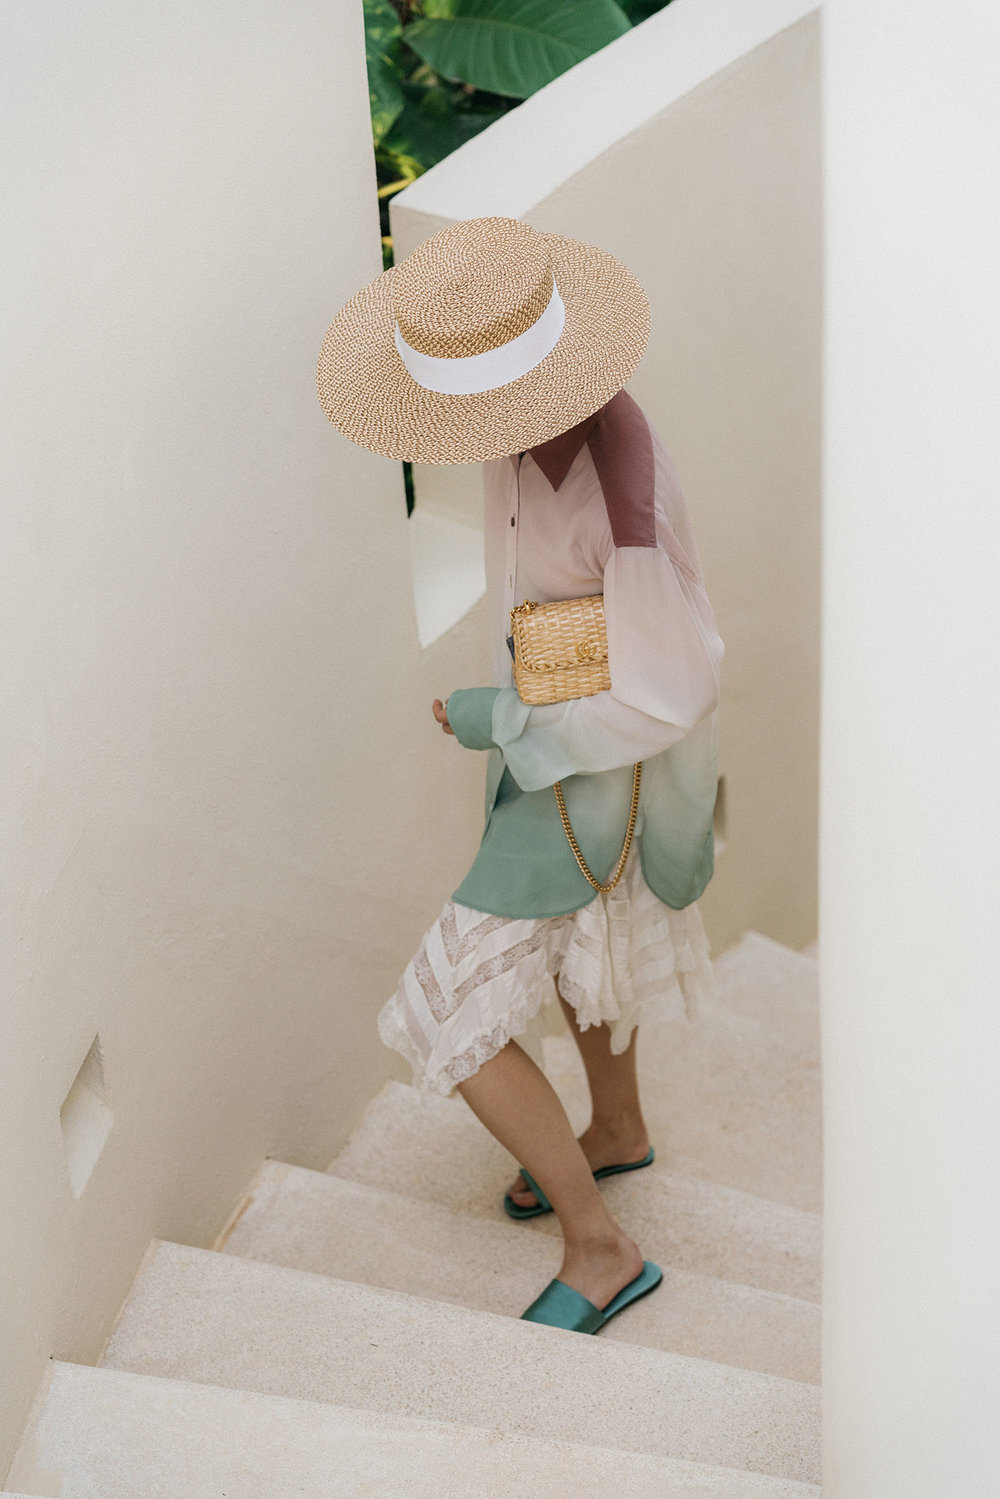 Sies Marjan Blouse, Philosophy di Lorenzo Serafini Skirt,  The Row Slides , Gucci Bag,  Eric Javits Hat ,  Céline Sunglasses